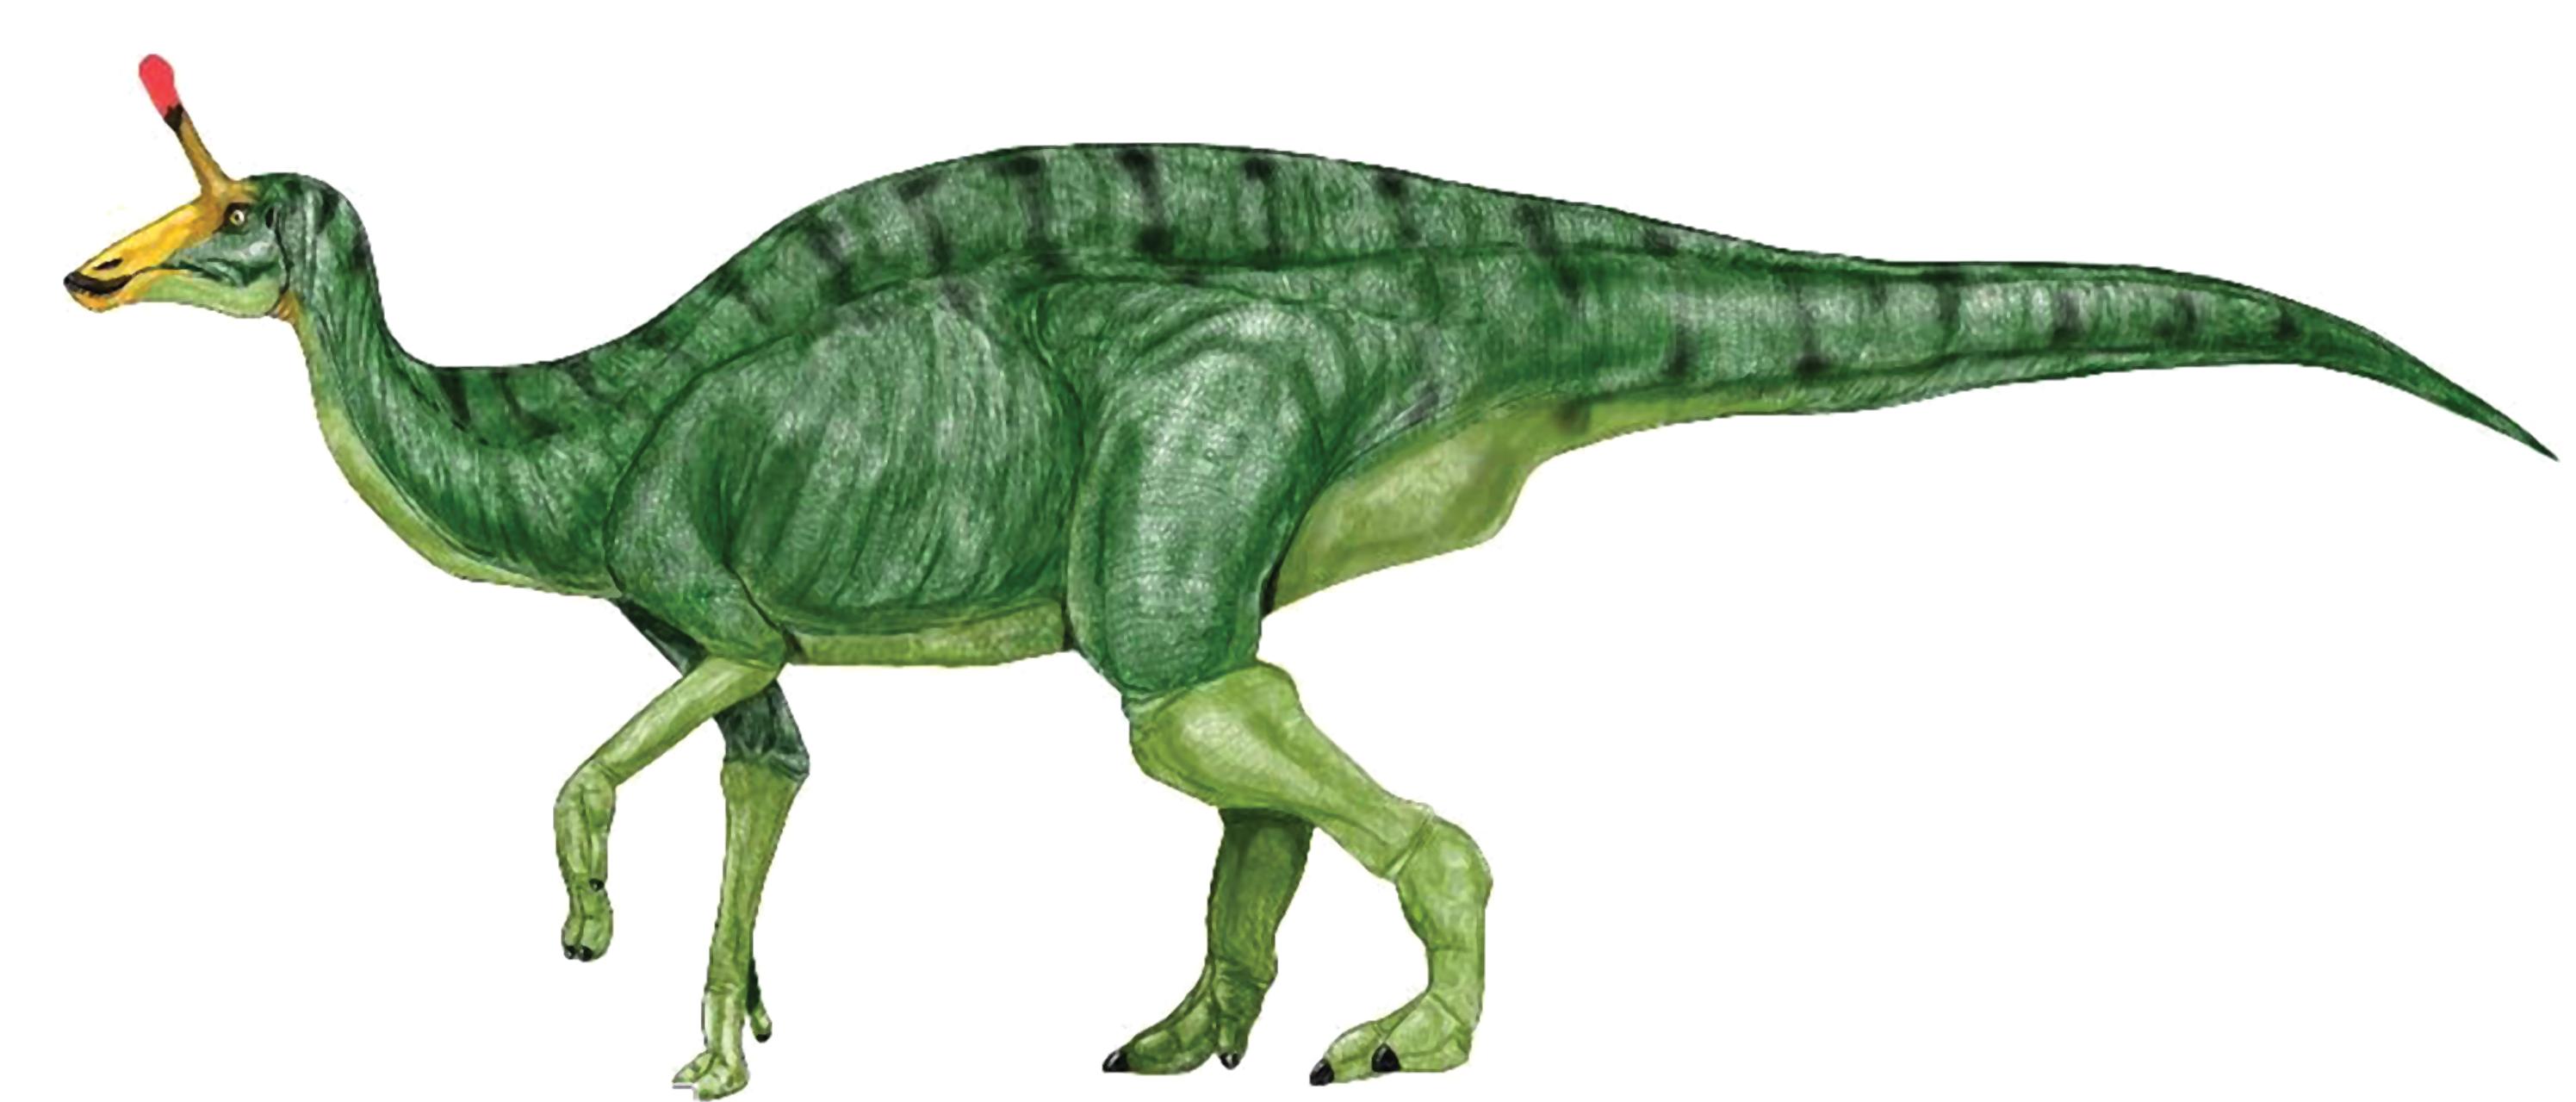 dinosaur clipart - Google Search | Dinosaurs Silhouettes, Vectors ...